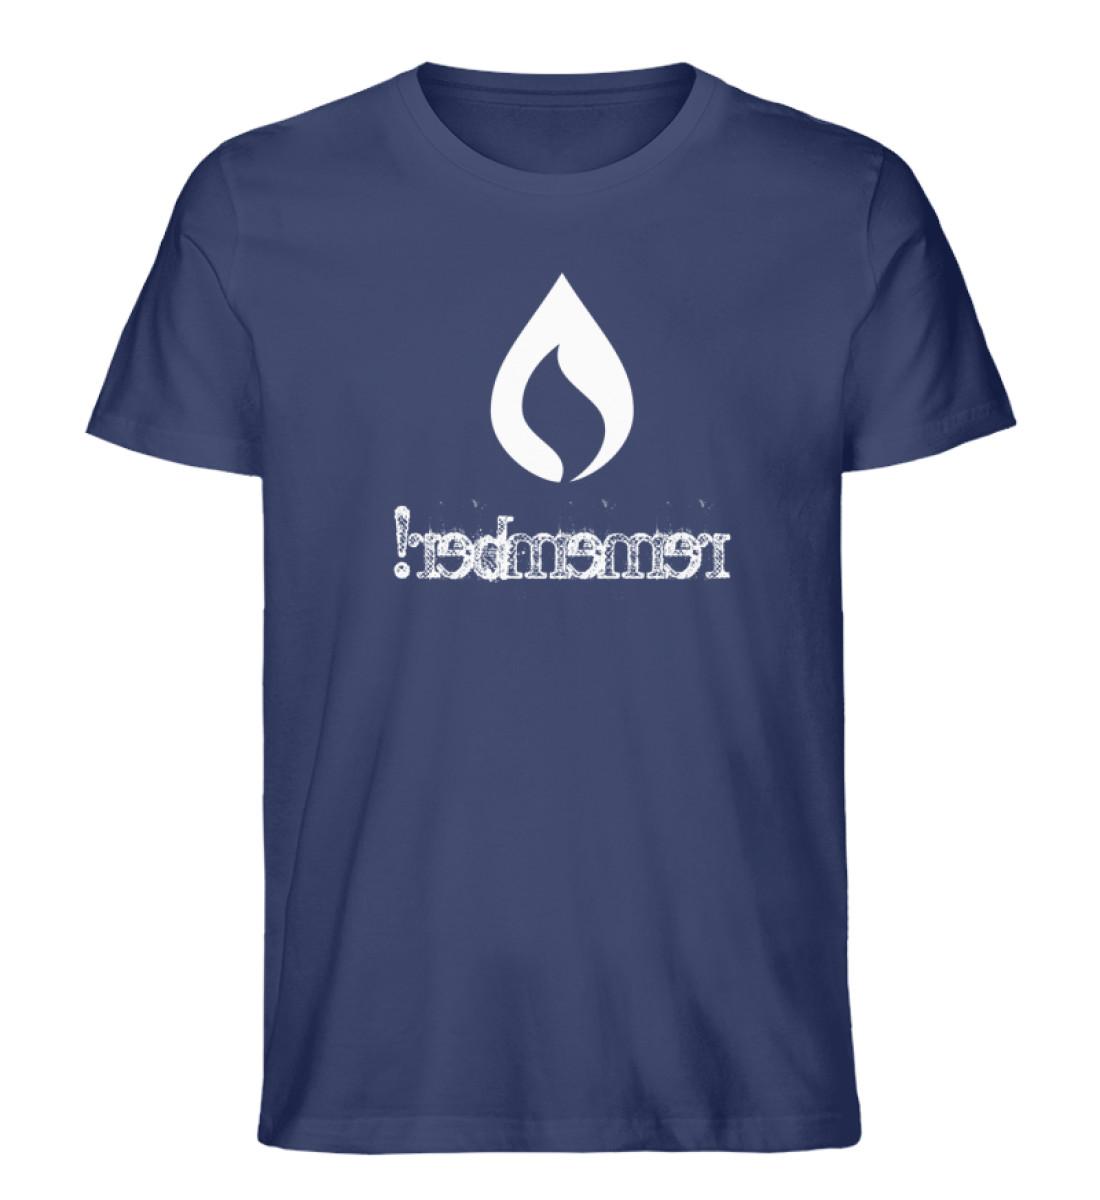 remember - Men Organic Shirt-6057